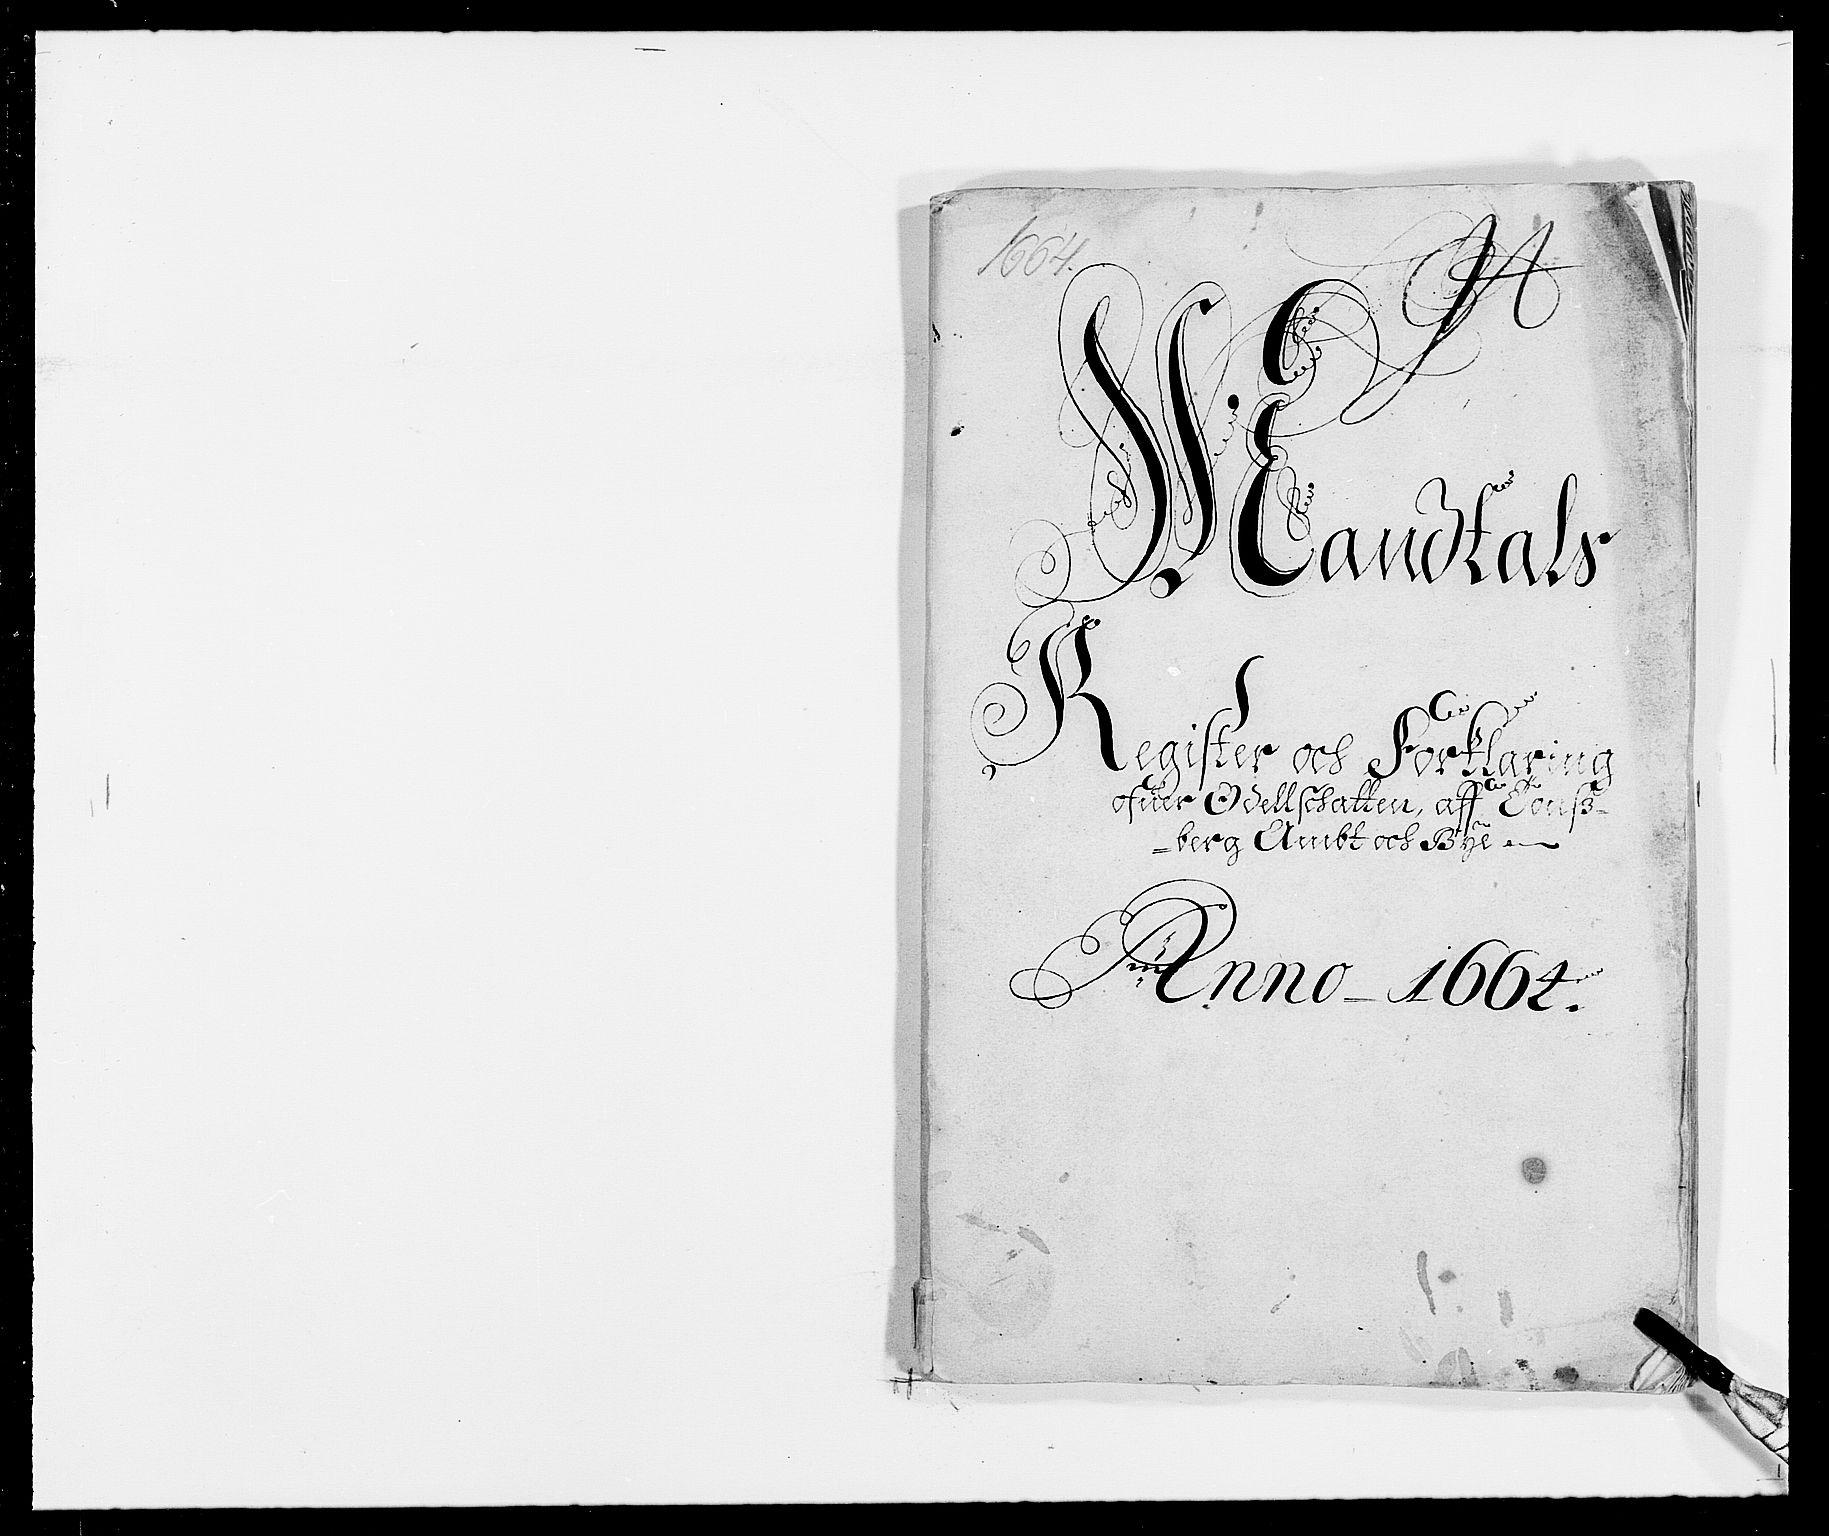 RA, Rentekammeret inntil 1814, Reviderte regnskaper, Fogderegnskap, R32/L1839: Fogderegnskap Jarlsberg grevskap, 1664-1673, s. 228